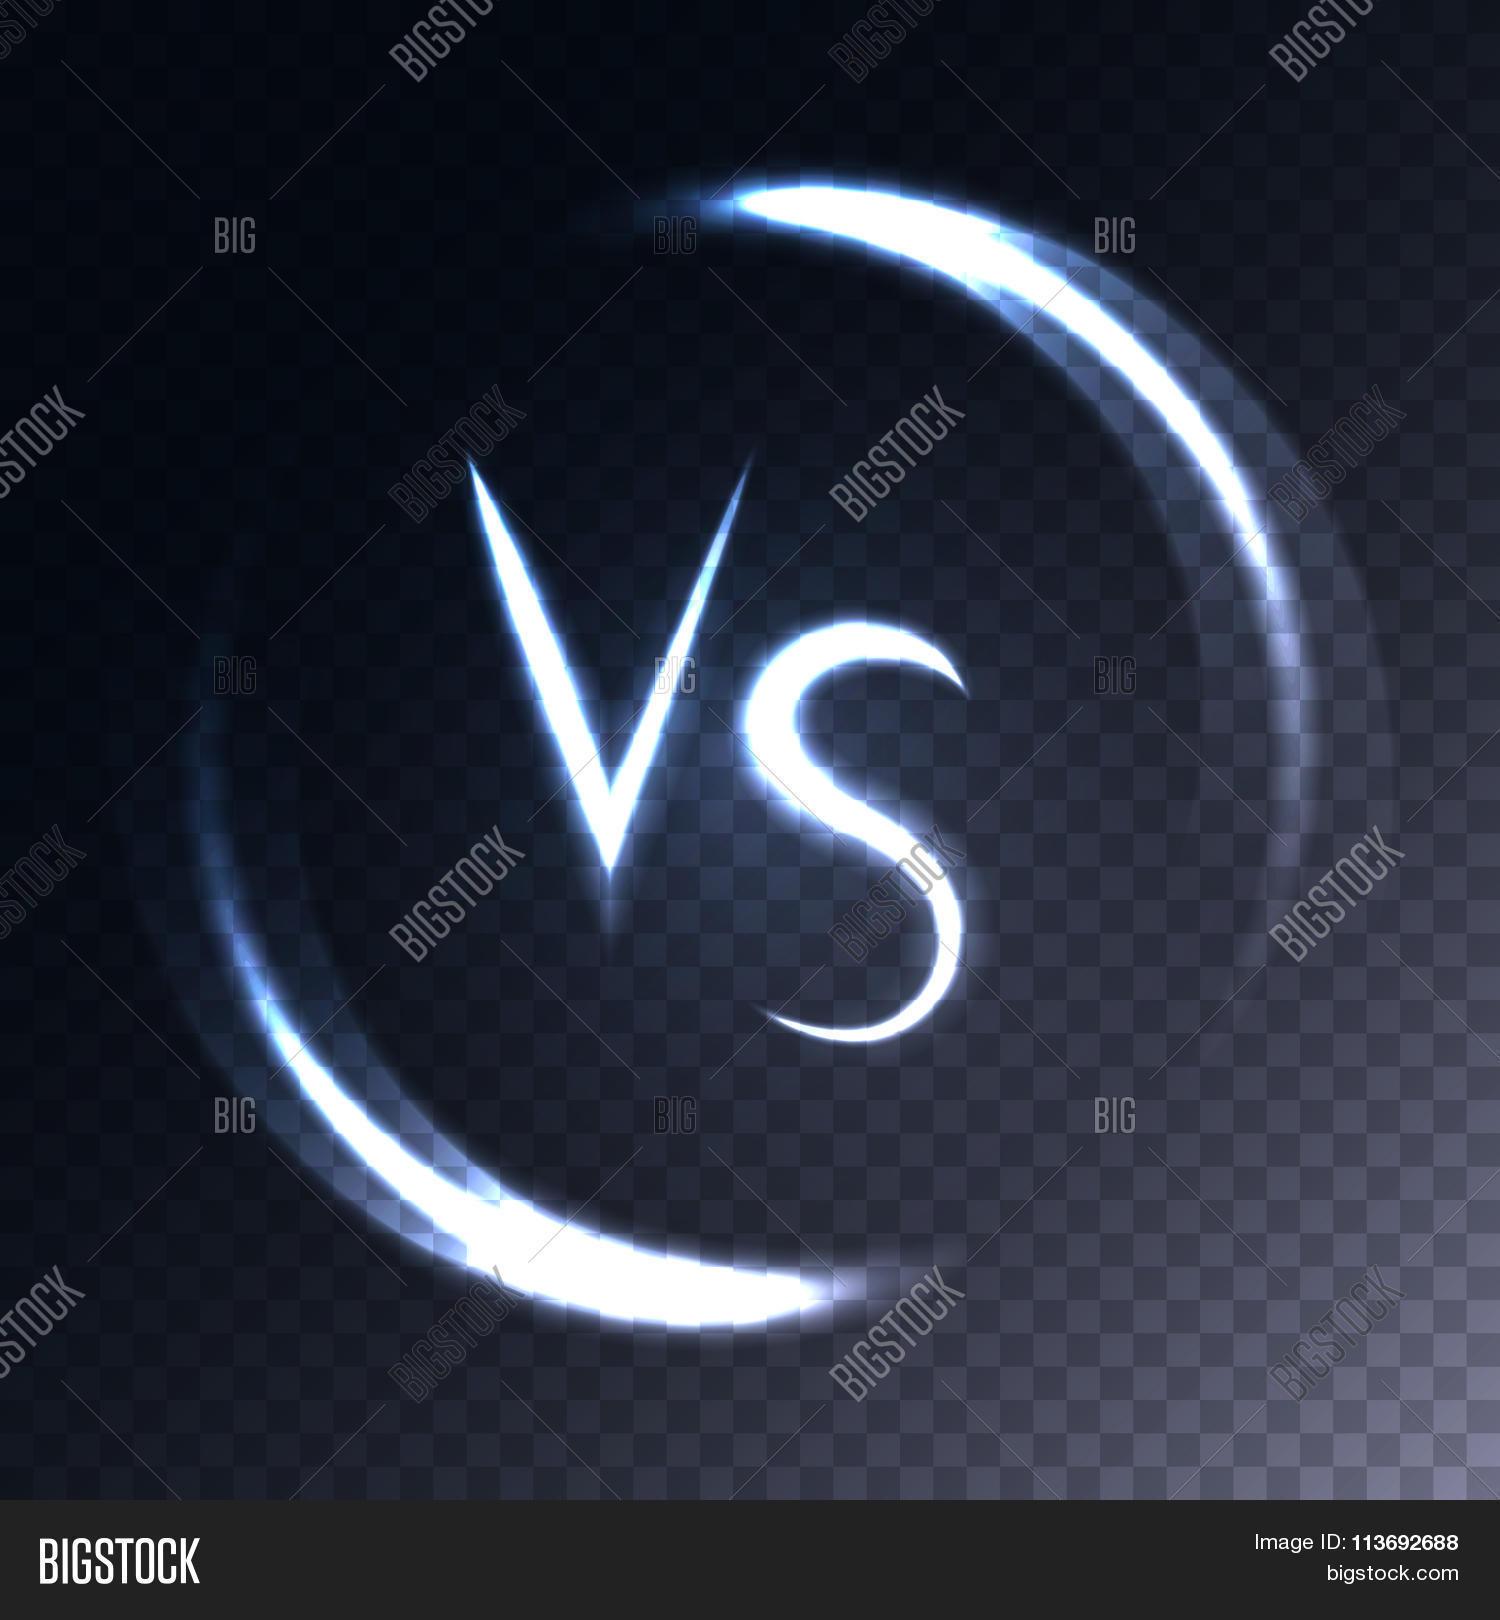 Versus Letters Vector Photo Free Trial Bigstock